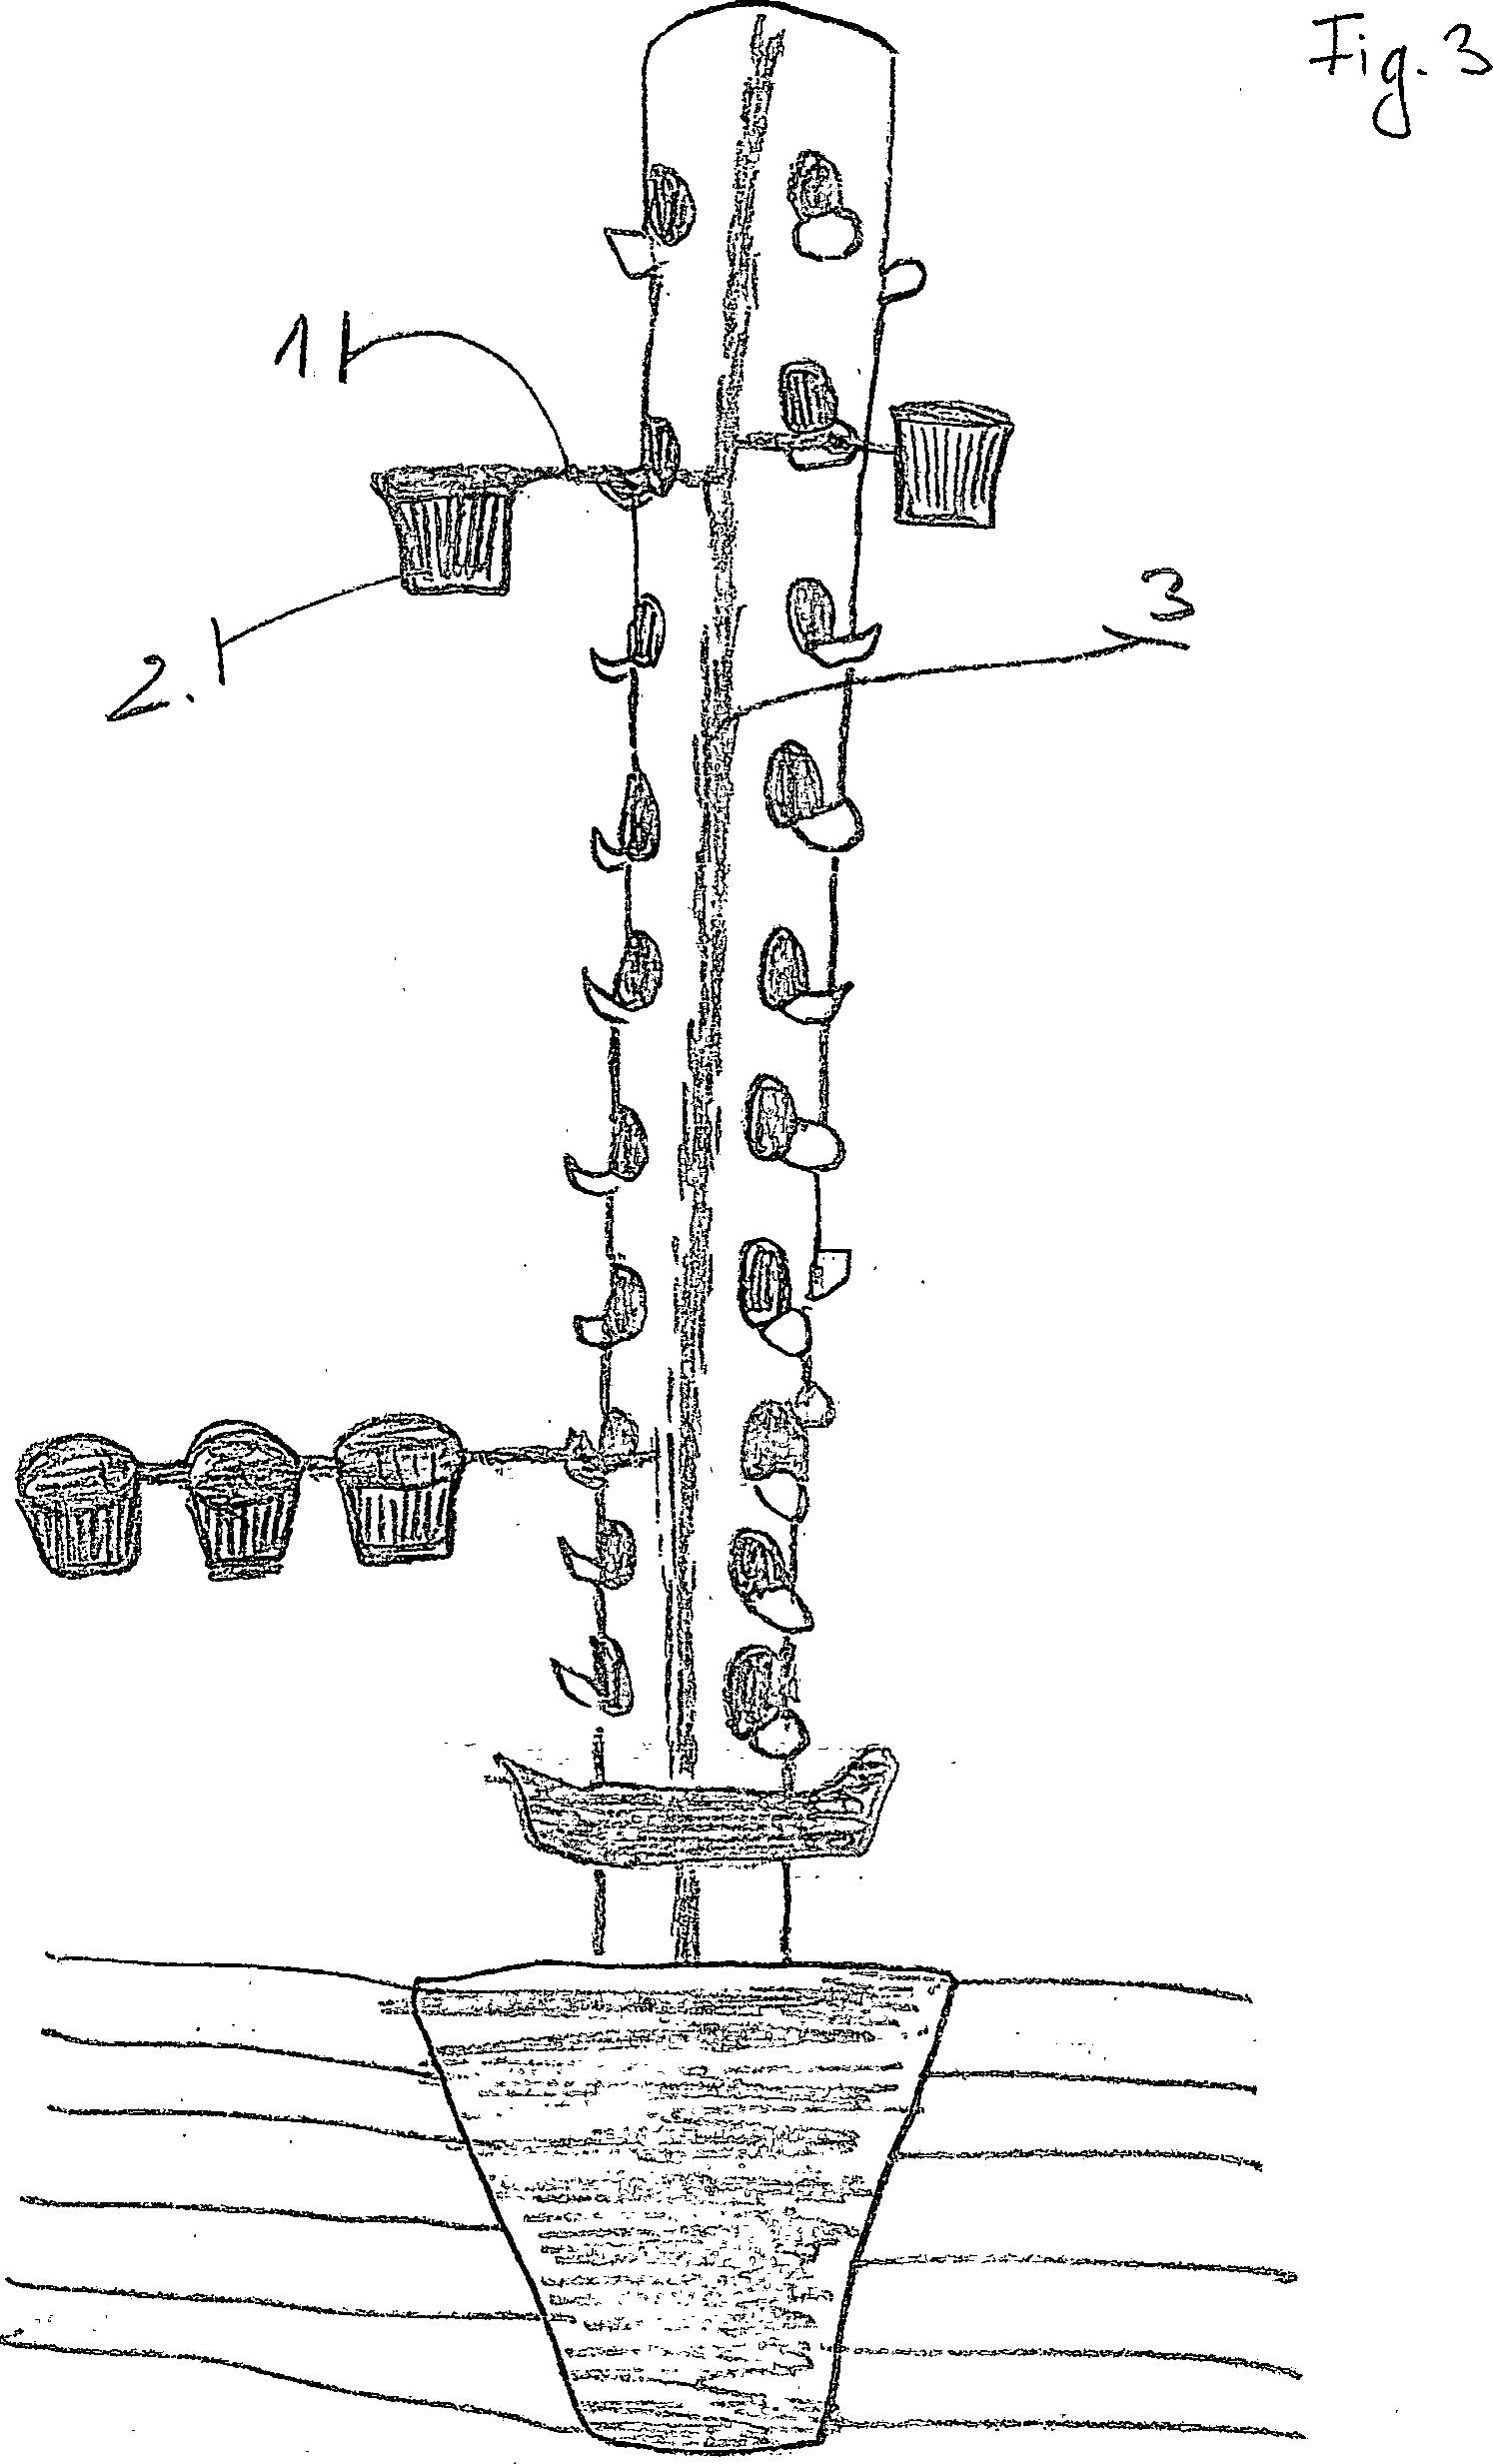 patent de202012007938u1 erdbeerbaum system arbutus. Black Bedroom Furniture Sets. Home Design Ideas